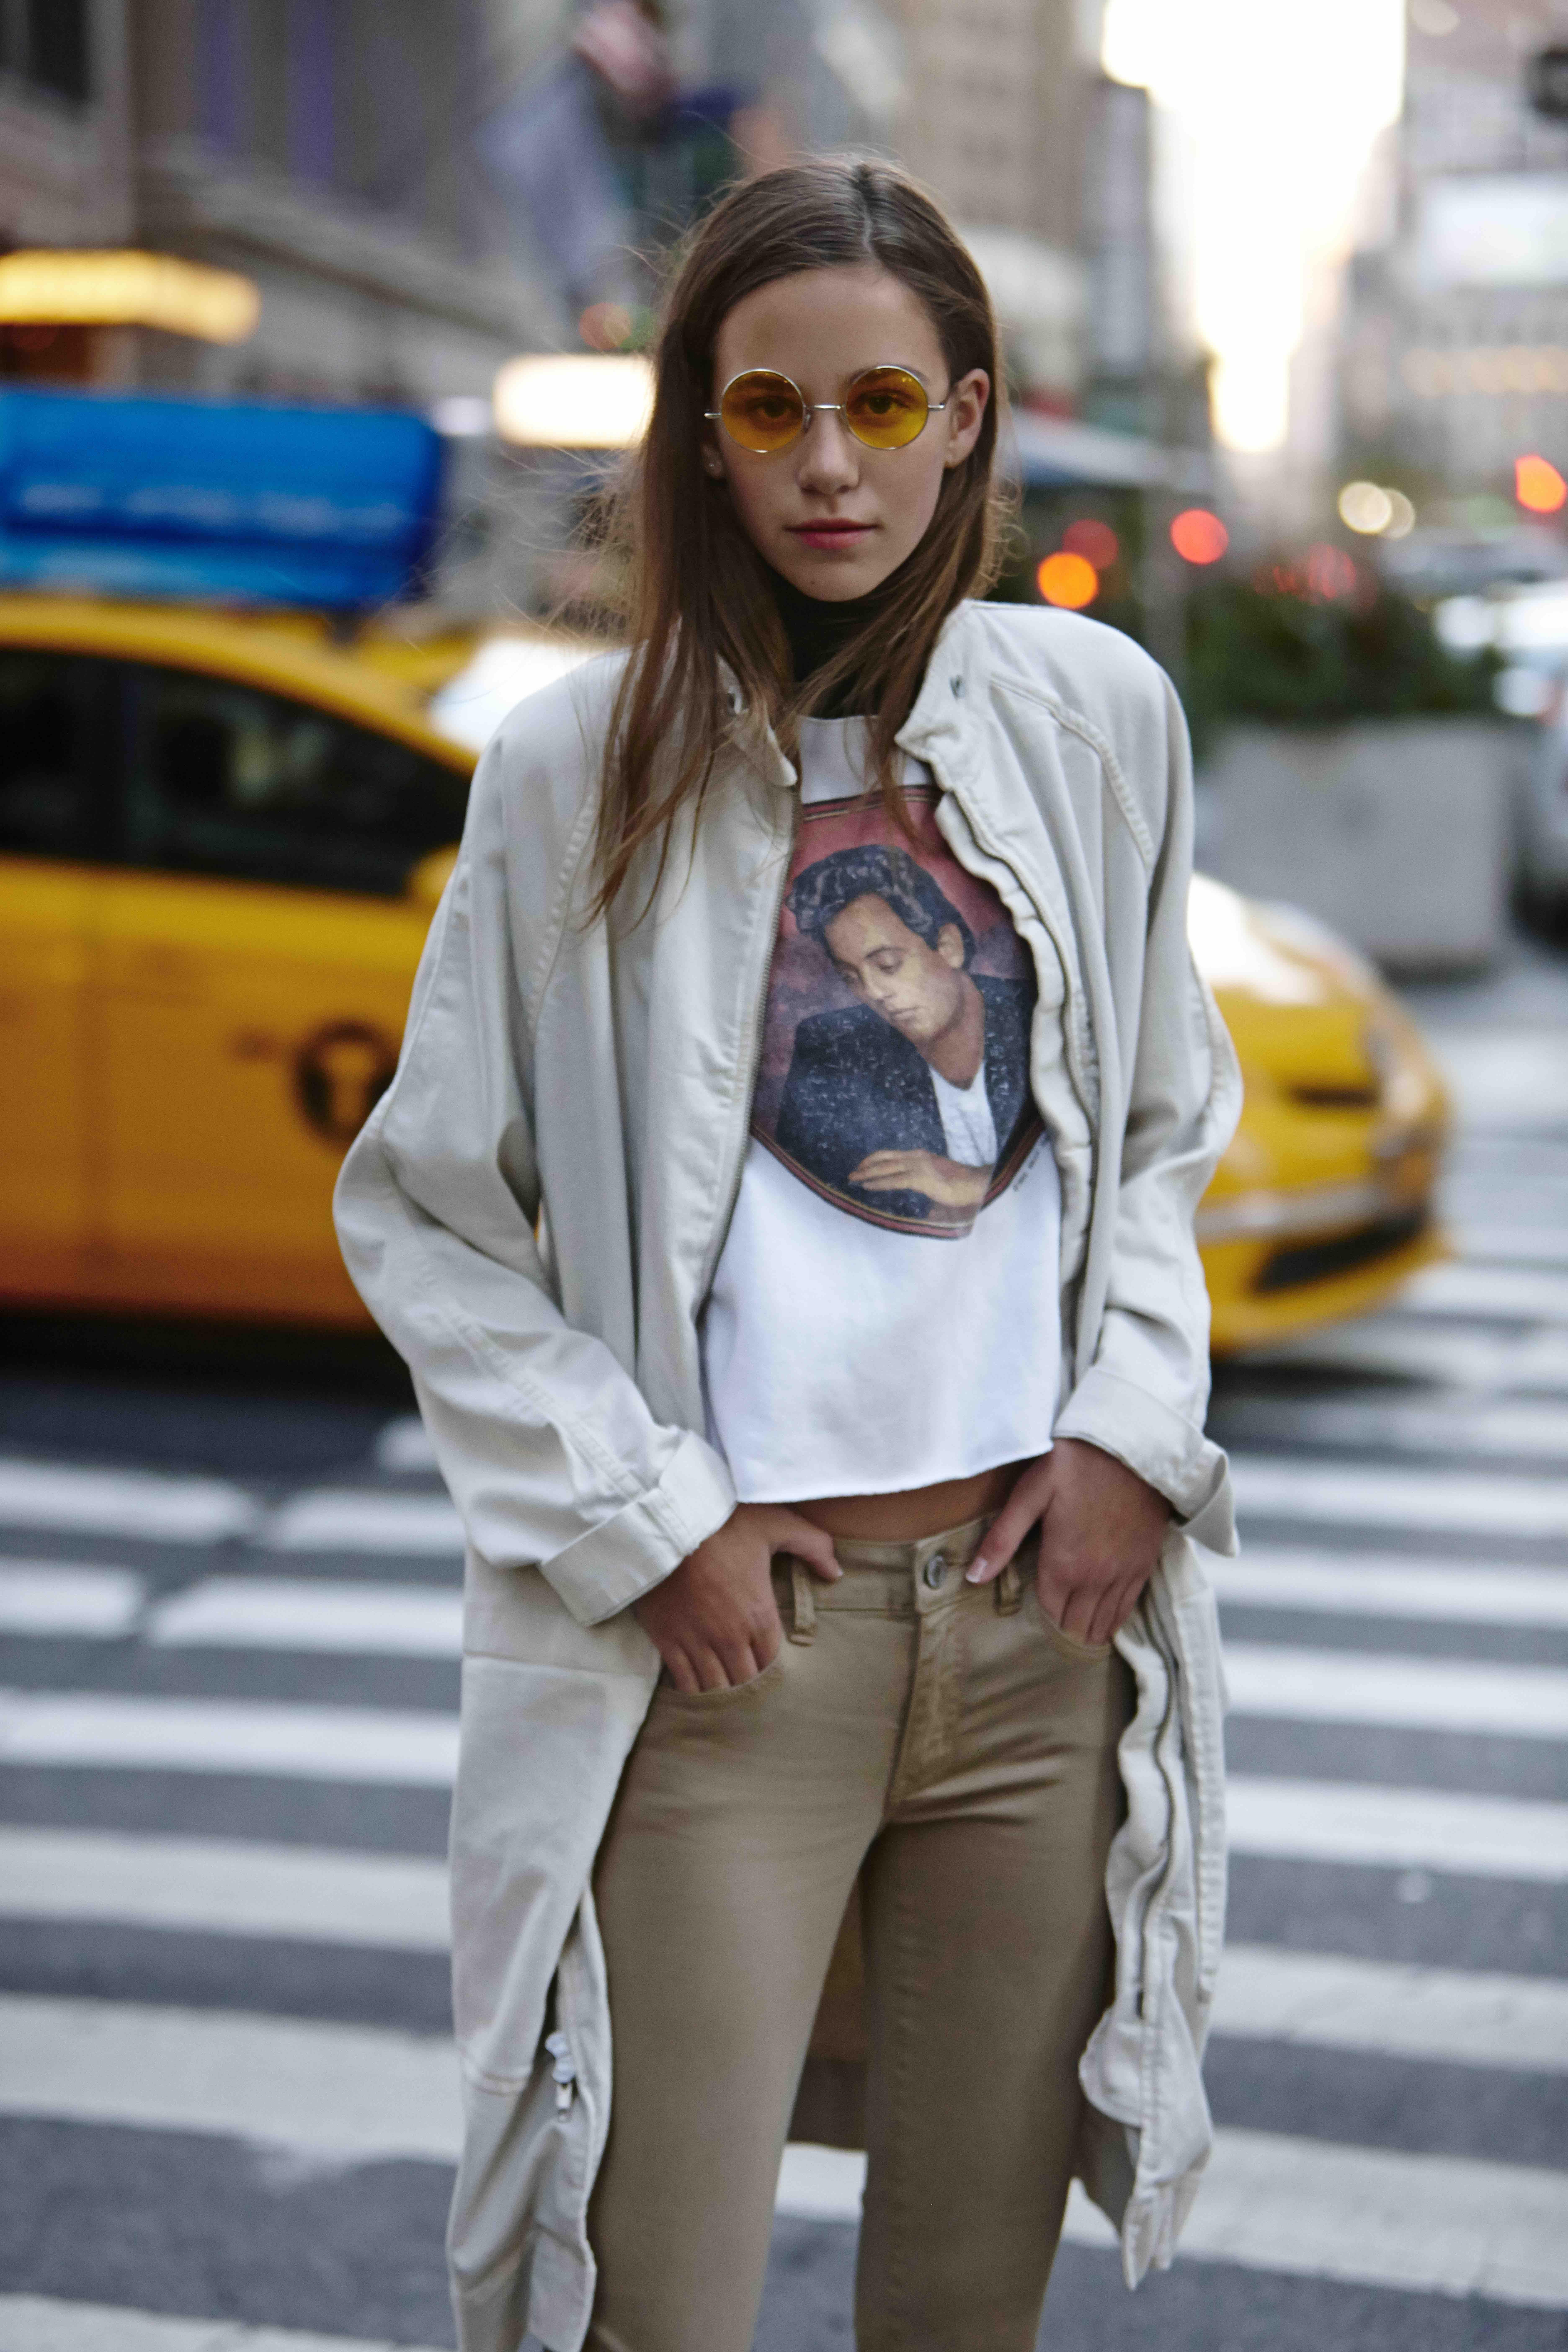 PHOTO: ANTHONY FRIEND NYC